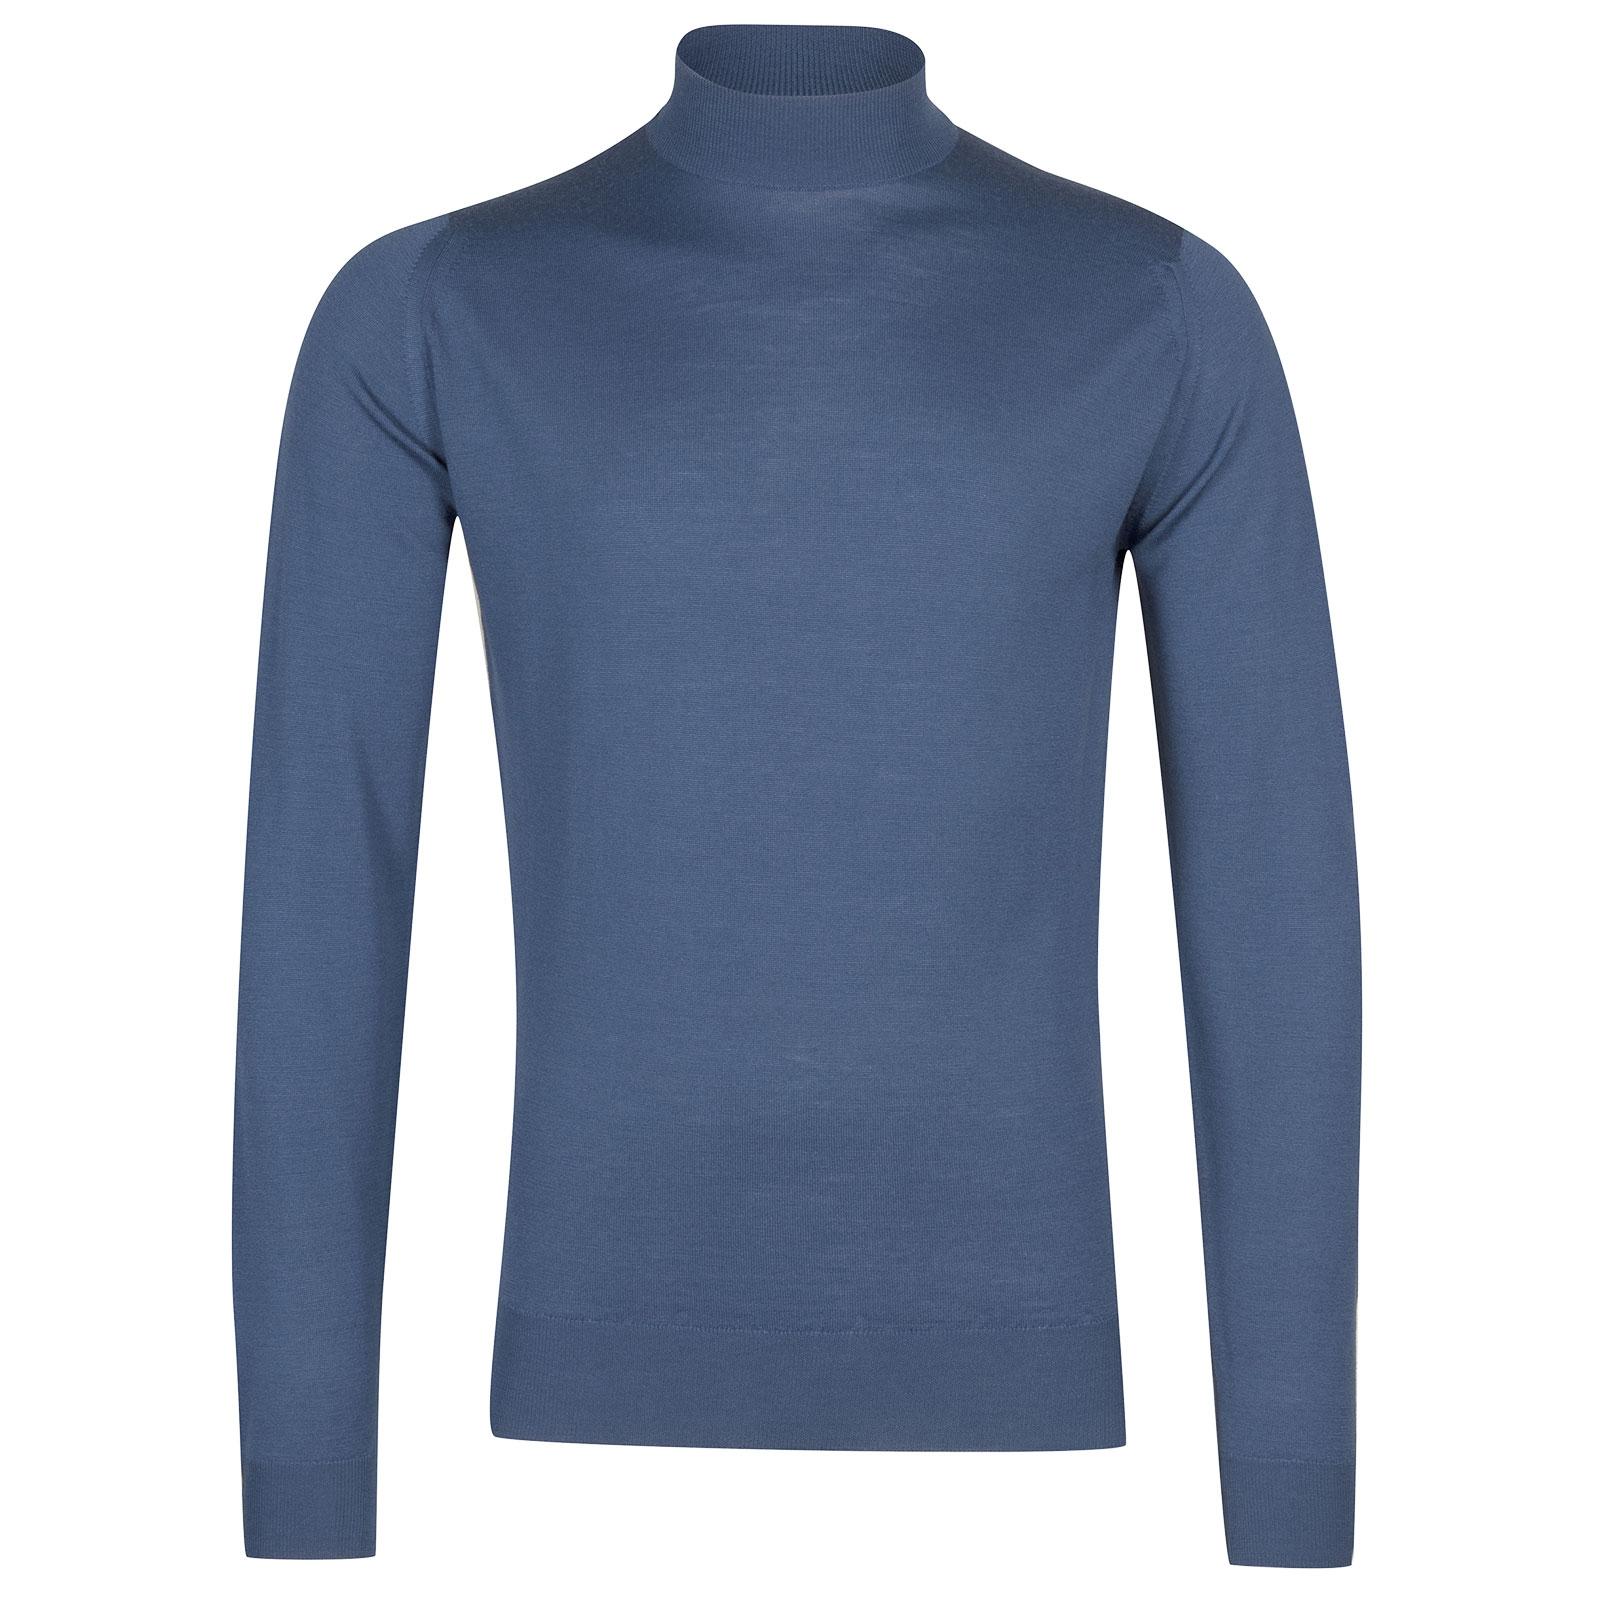 John Smedley Harcourt in Blue Iris Pullover-SML